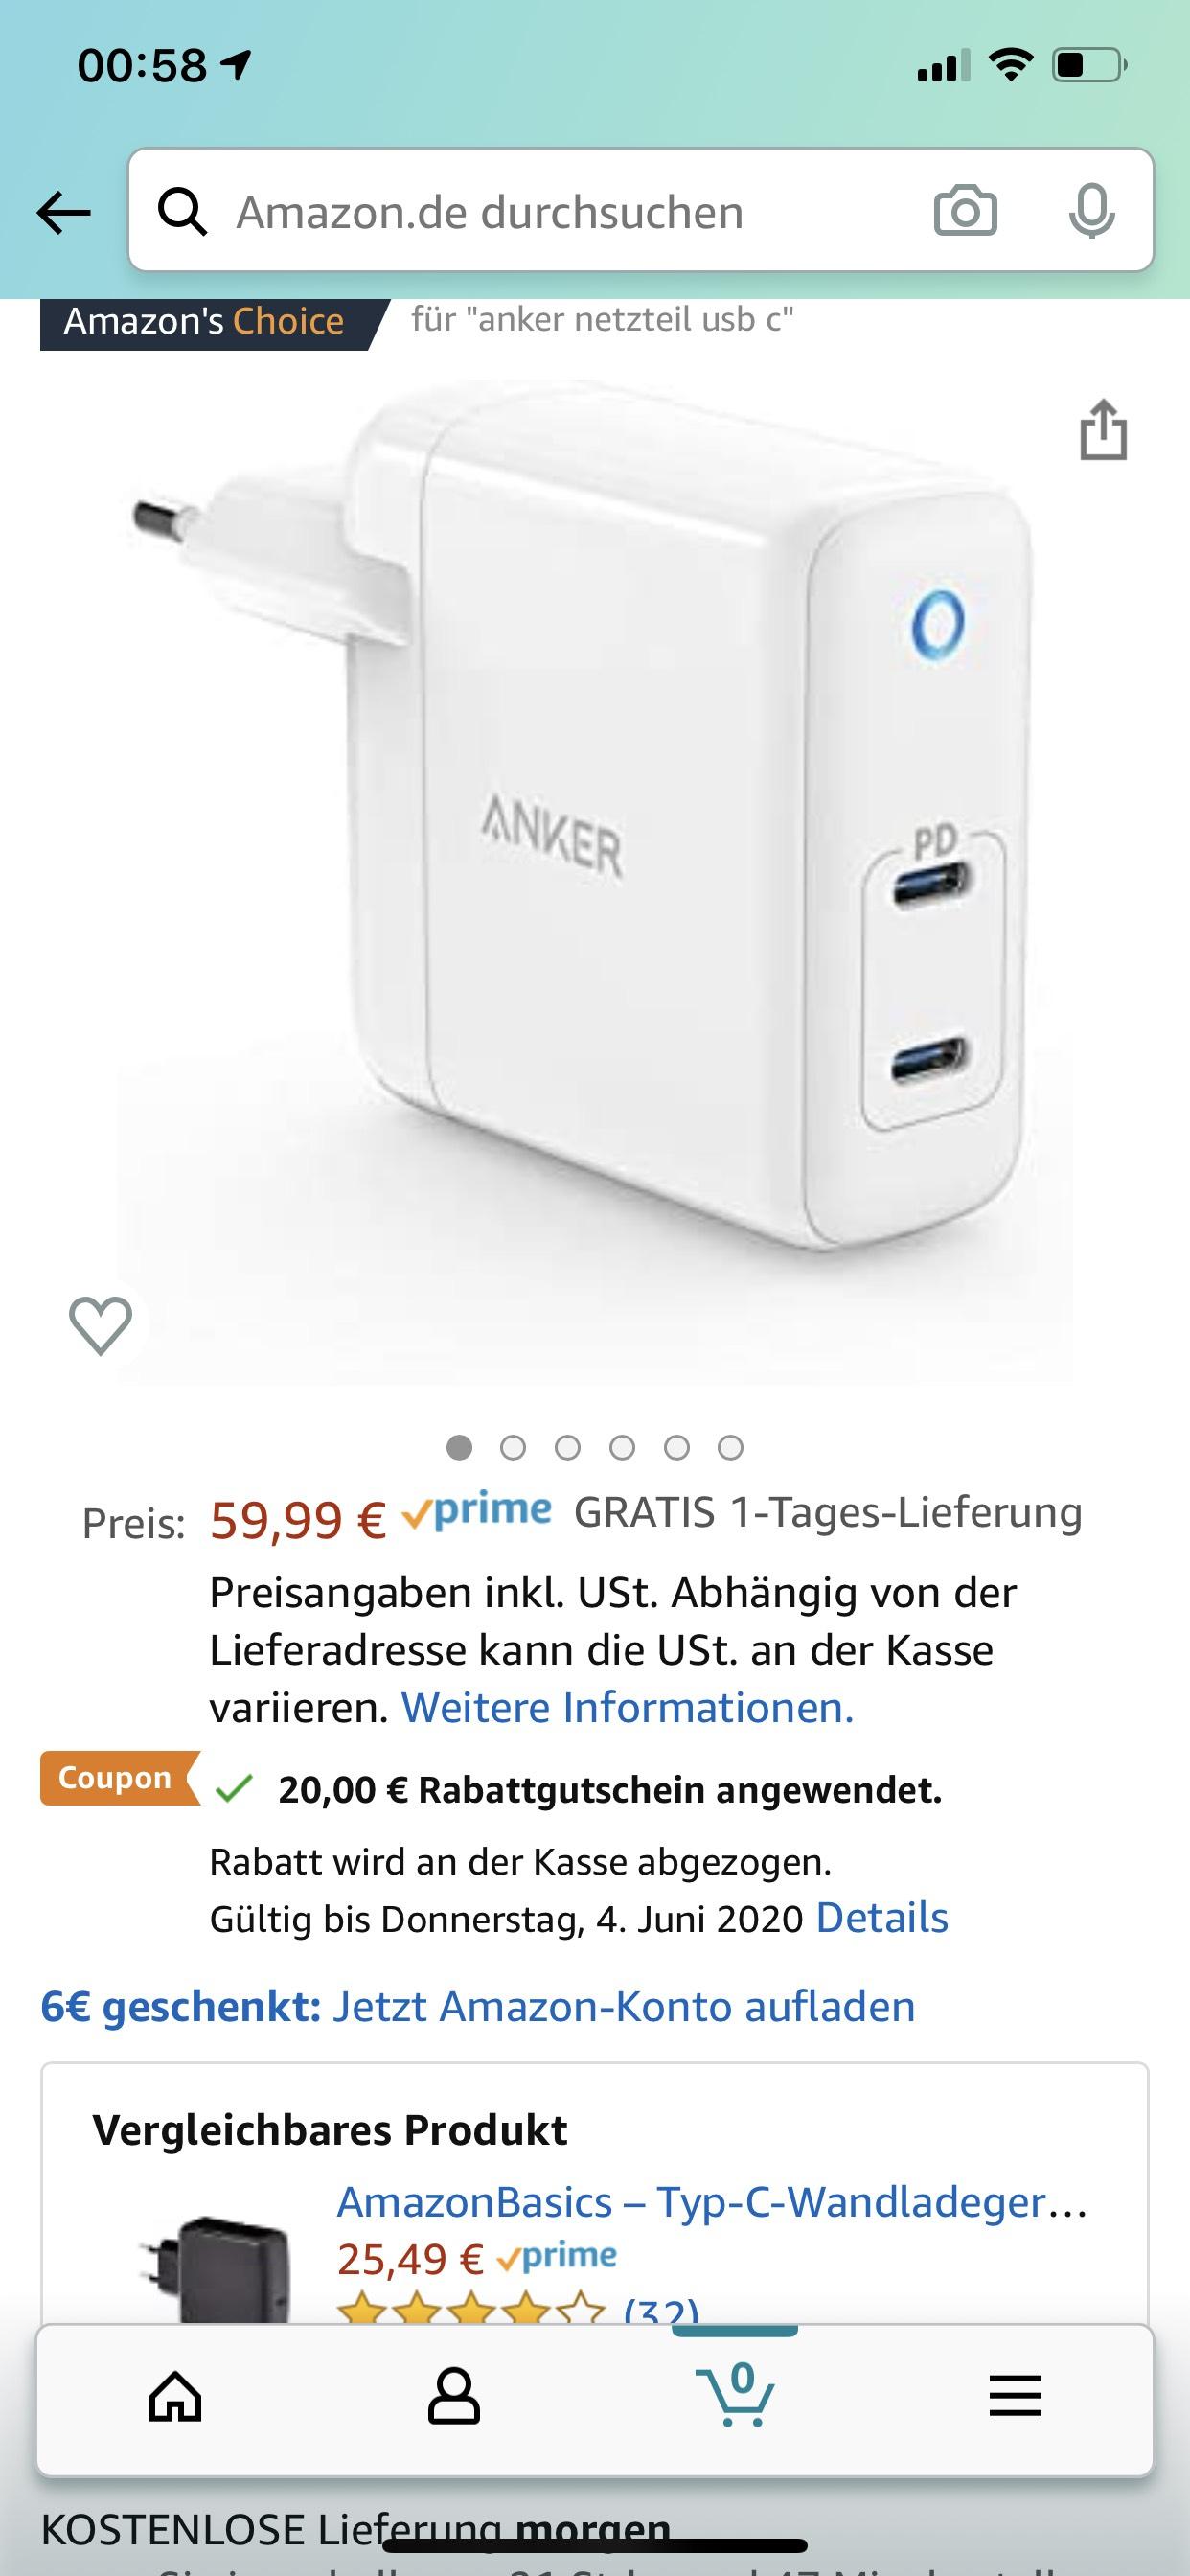 [Amazon Prime] Anker PowerPort Atom PD 2, 60W 2-Port USB-C Ladegerät mit Power Delivery für MacBook Pro